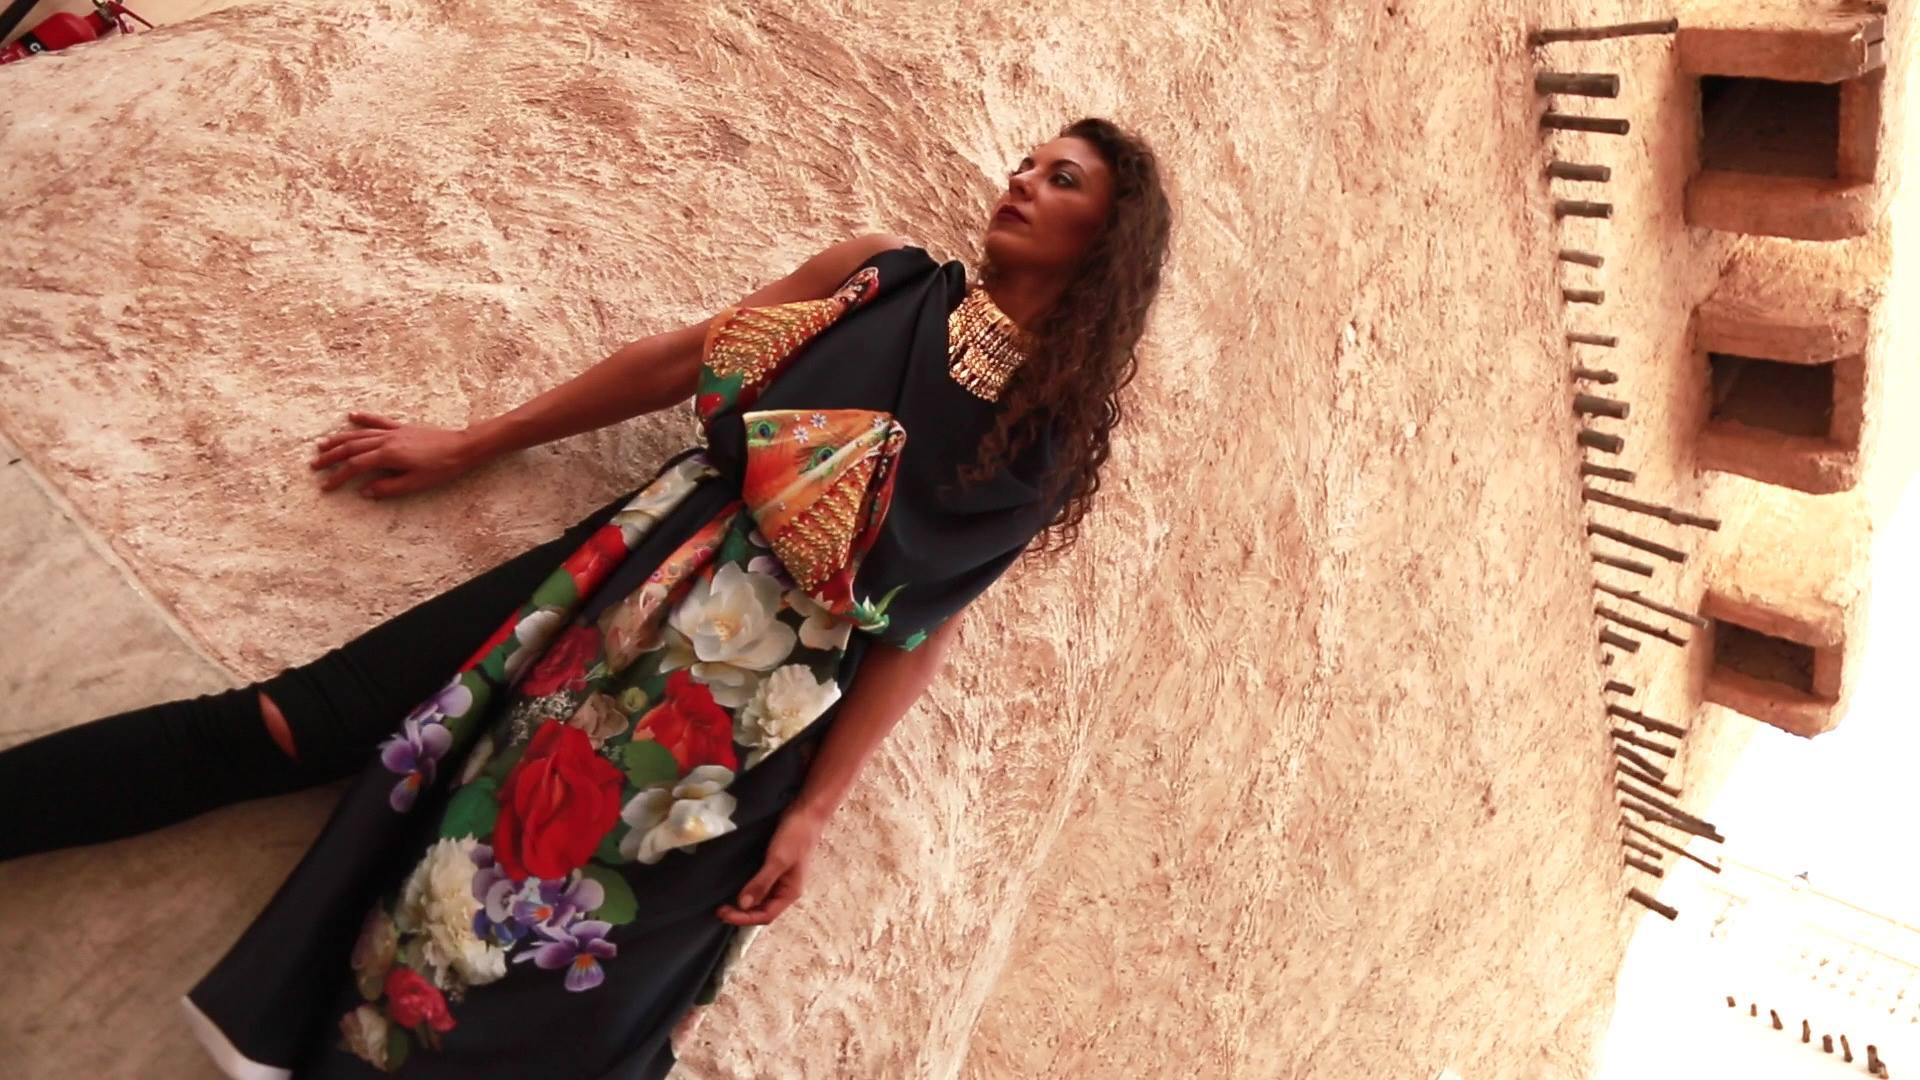 Sneak Peek of the photoshoot with lovely Mariana in Souq Waqif  Model: Mariana Arroyo Styling & Photography : Sahar Goudarzi